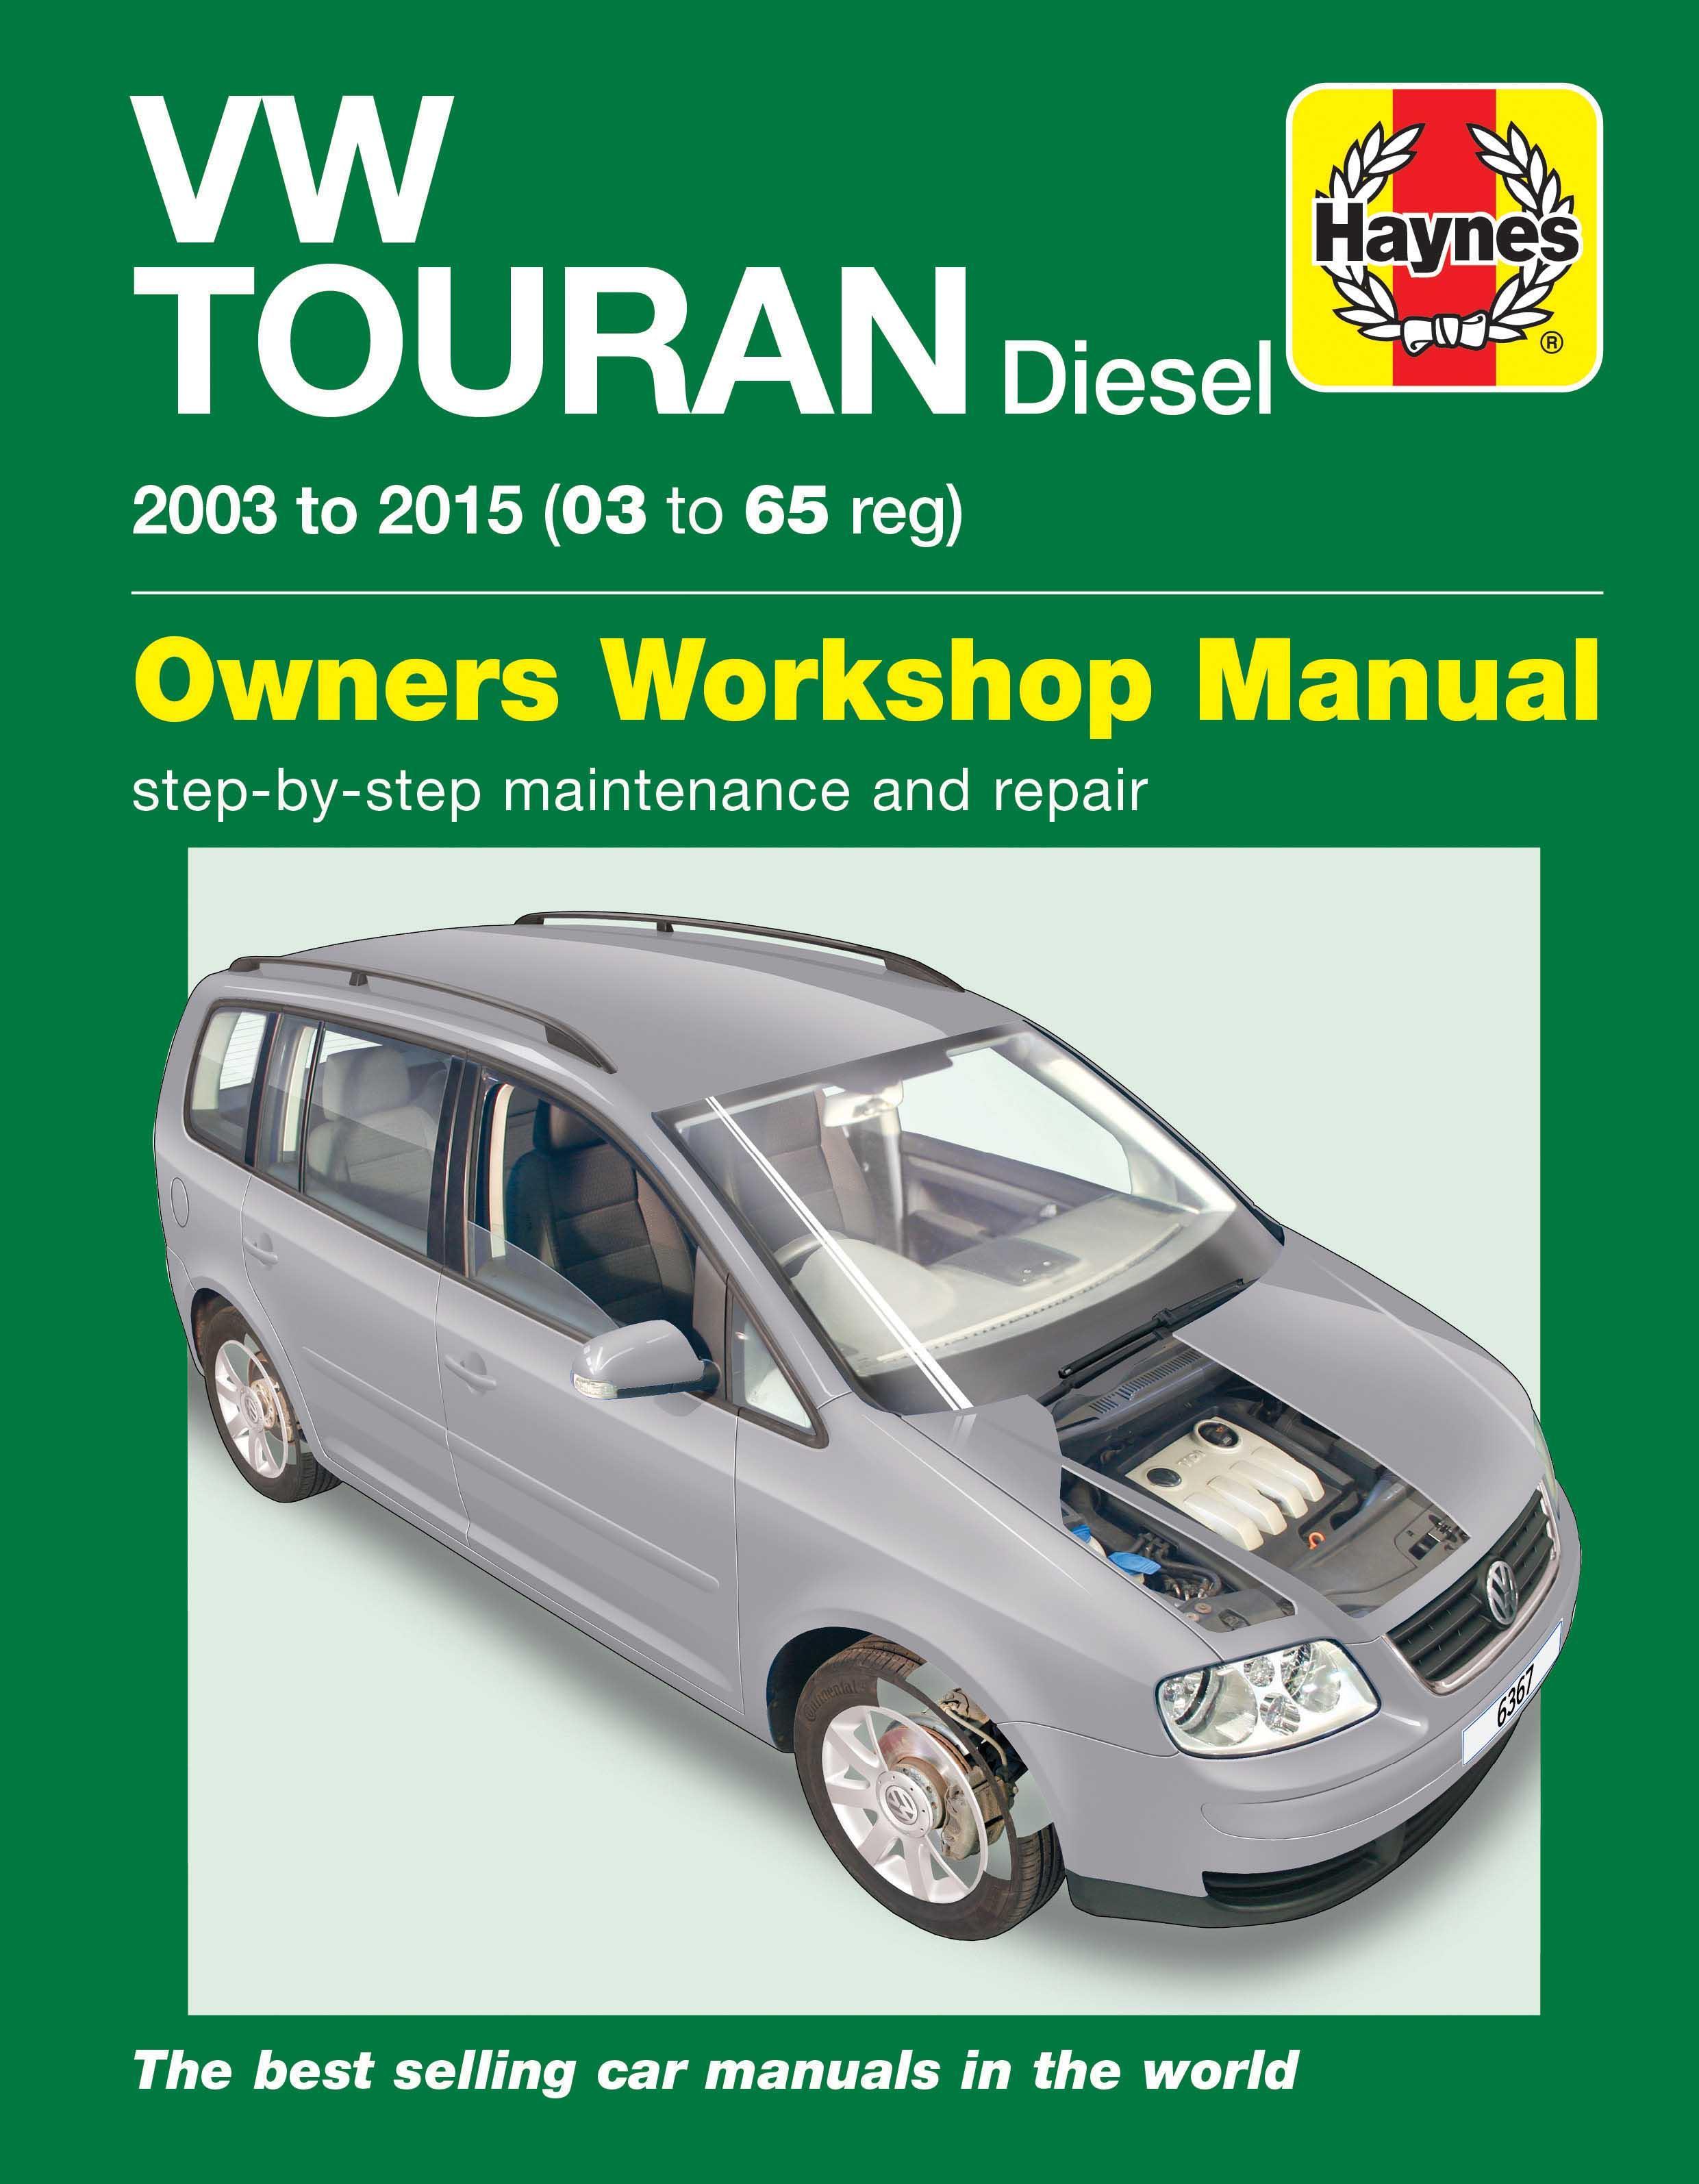 haynes vw touran diesel 03 15 m rh halfords com vw touran haynes manual vw touran workshop manual free download